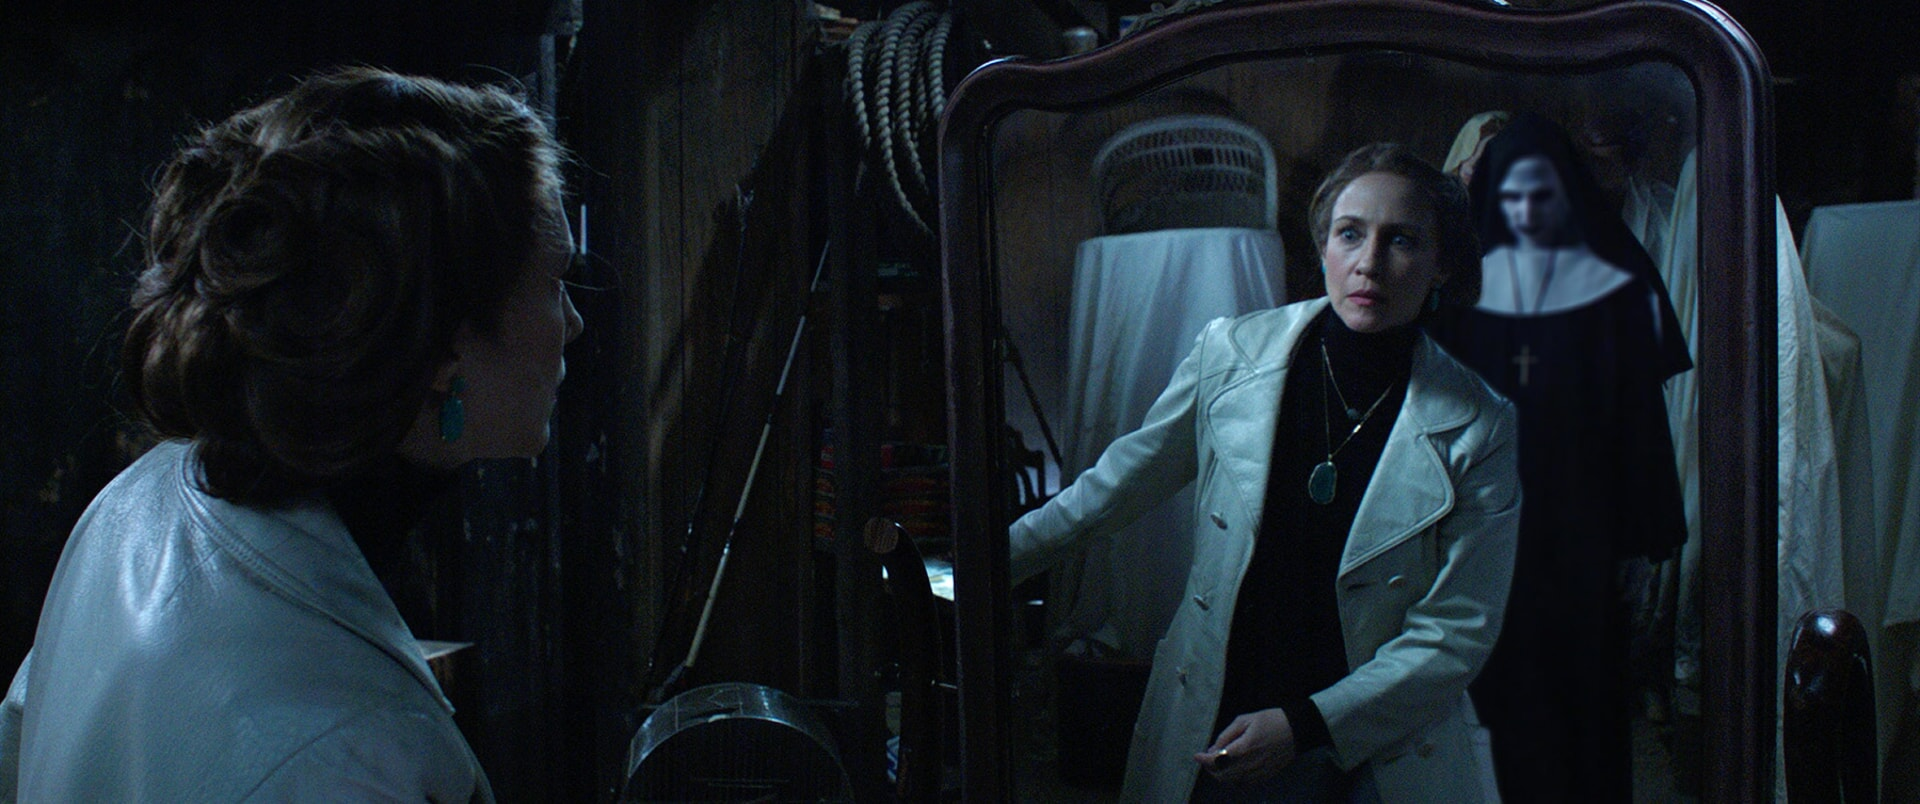 VERA FARMIGA as Lorraine Warren looking in mirror with ghostly nun showing its reflection